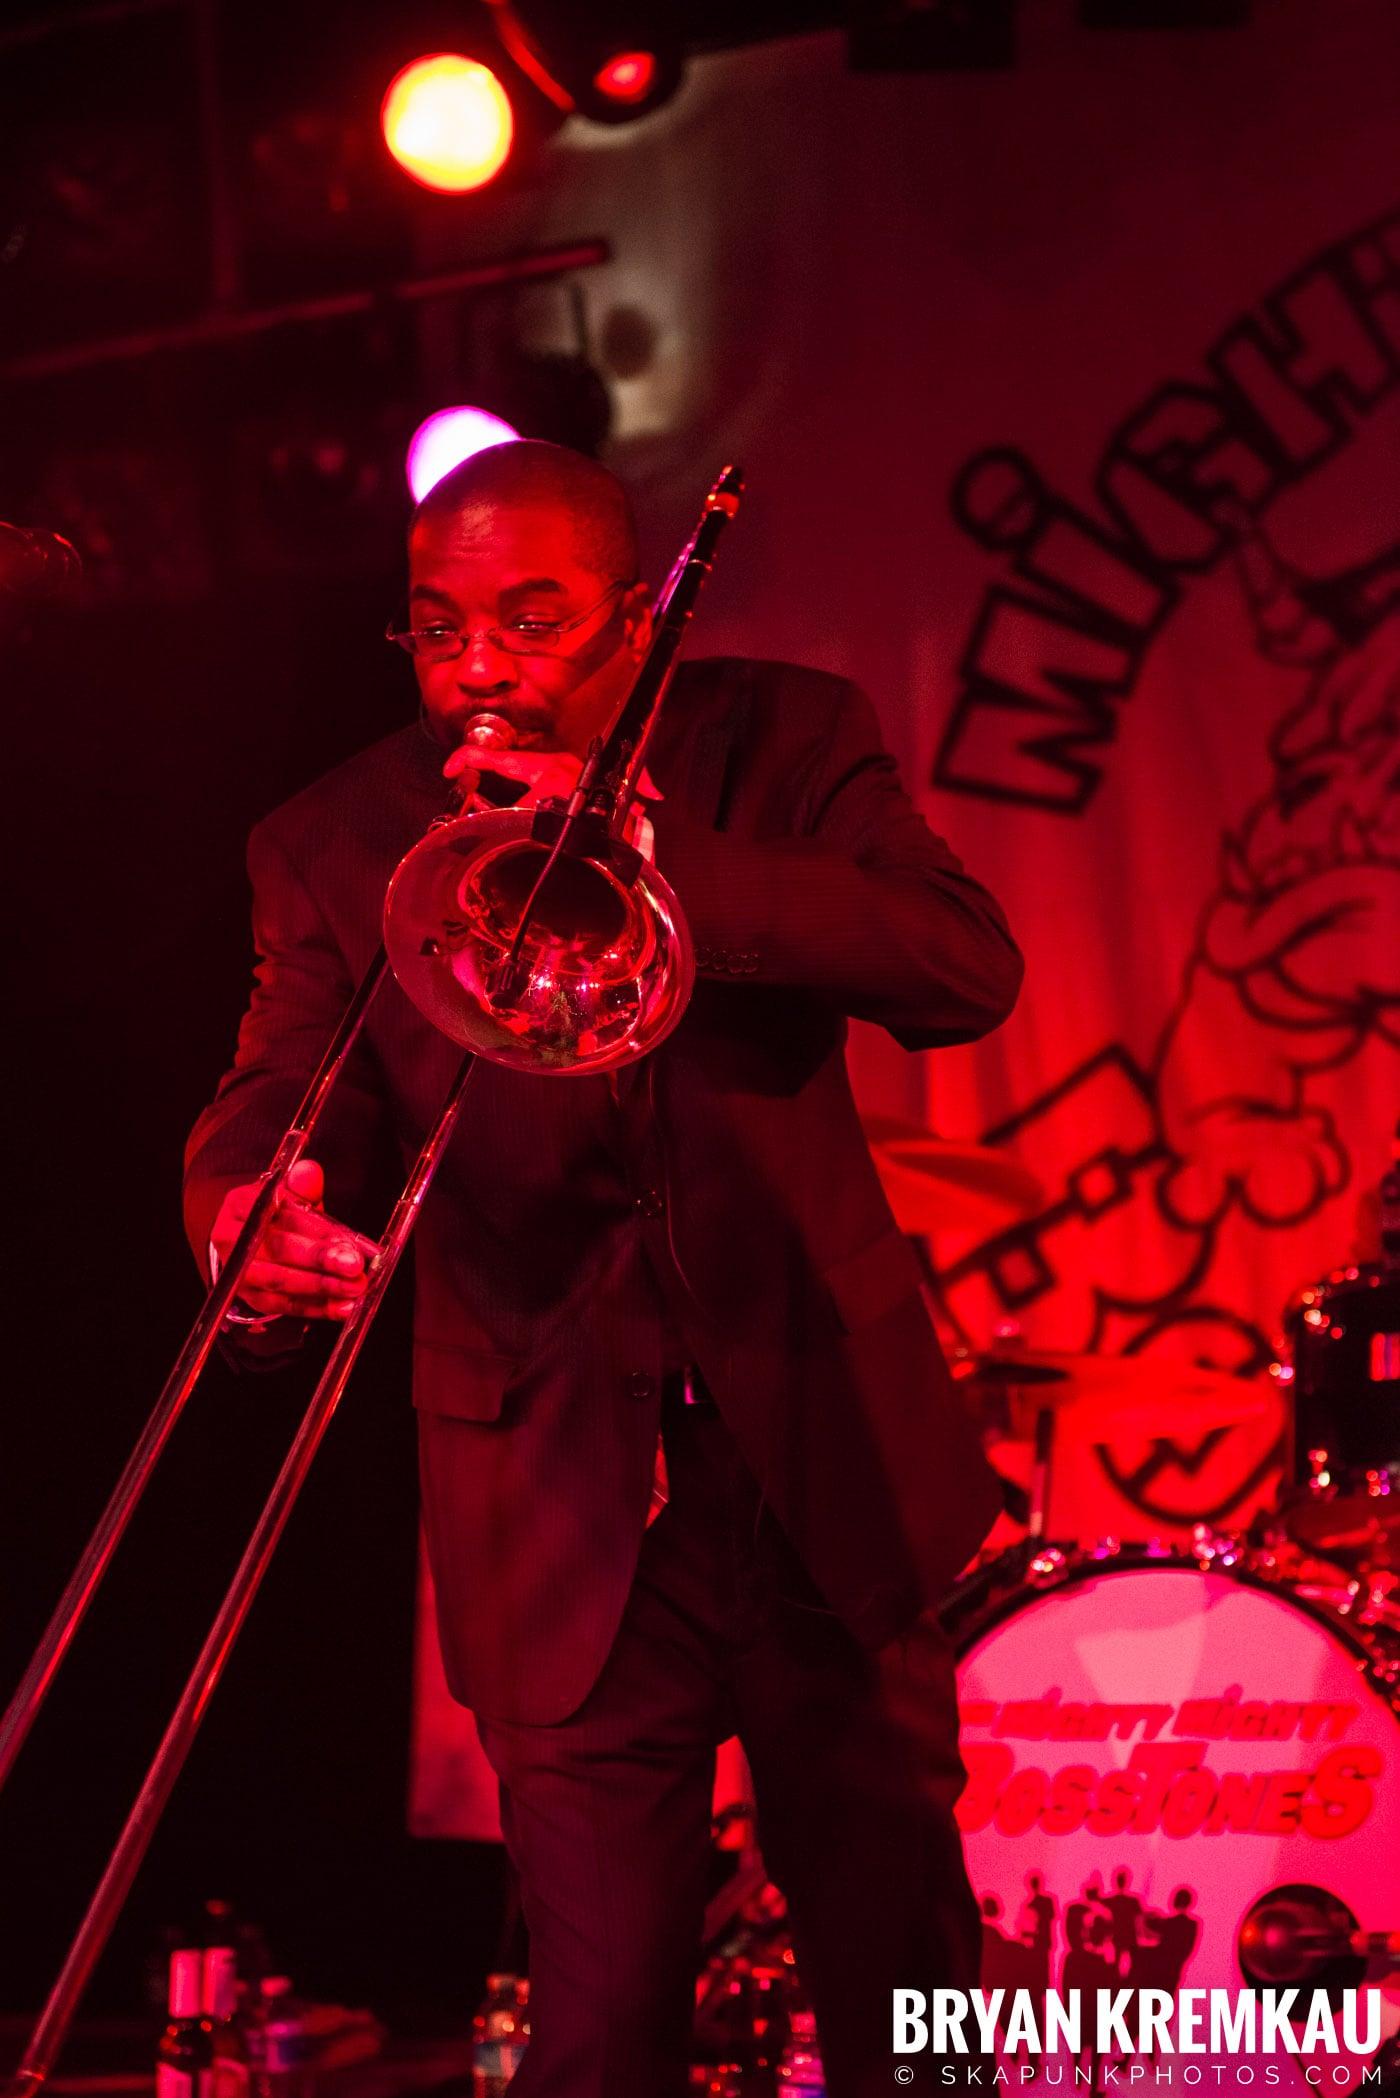 Mighty Mighty Bosstones @ Starland Ballroom, Sayreville, NJ - 7.29.17 (19)